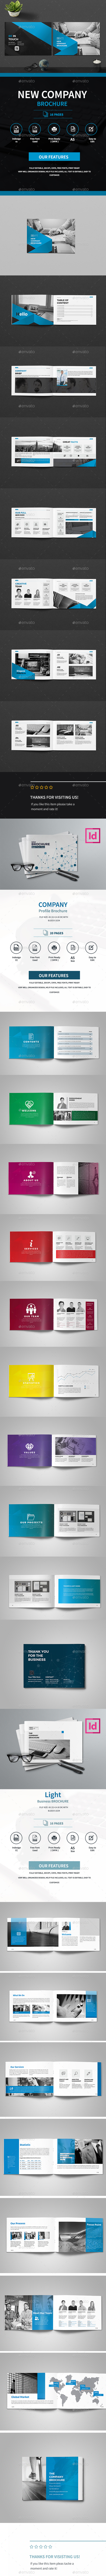 Indd Corporate Business Brochure Bundle - Corporate Brochures